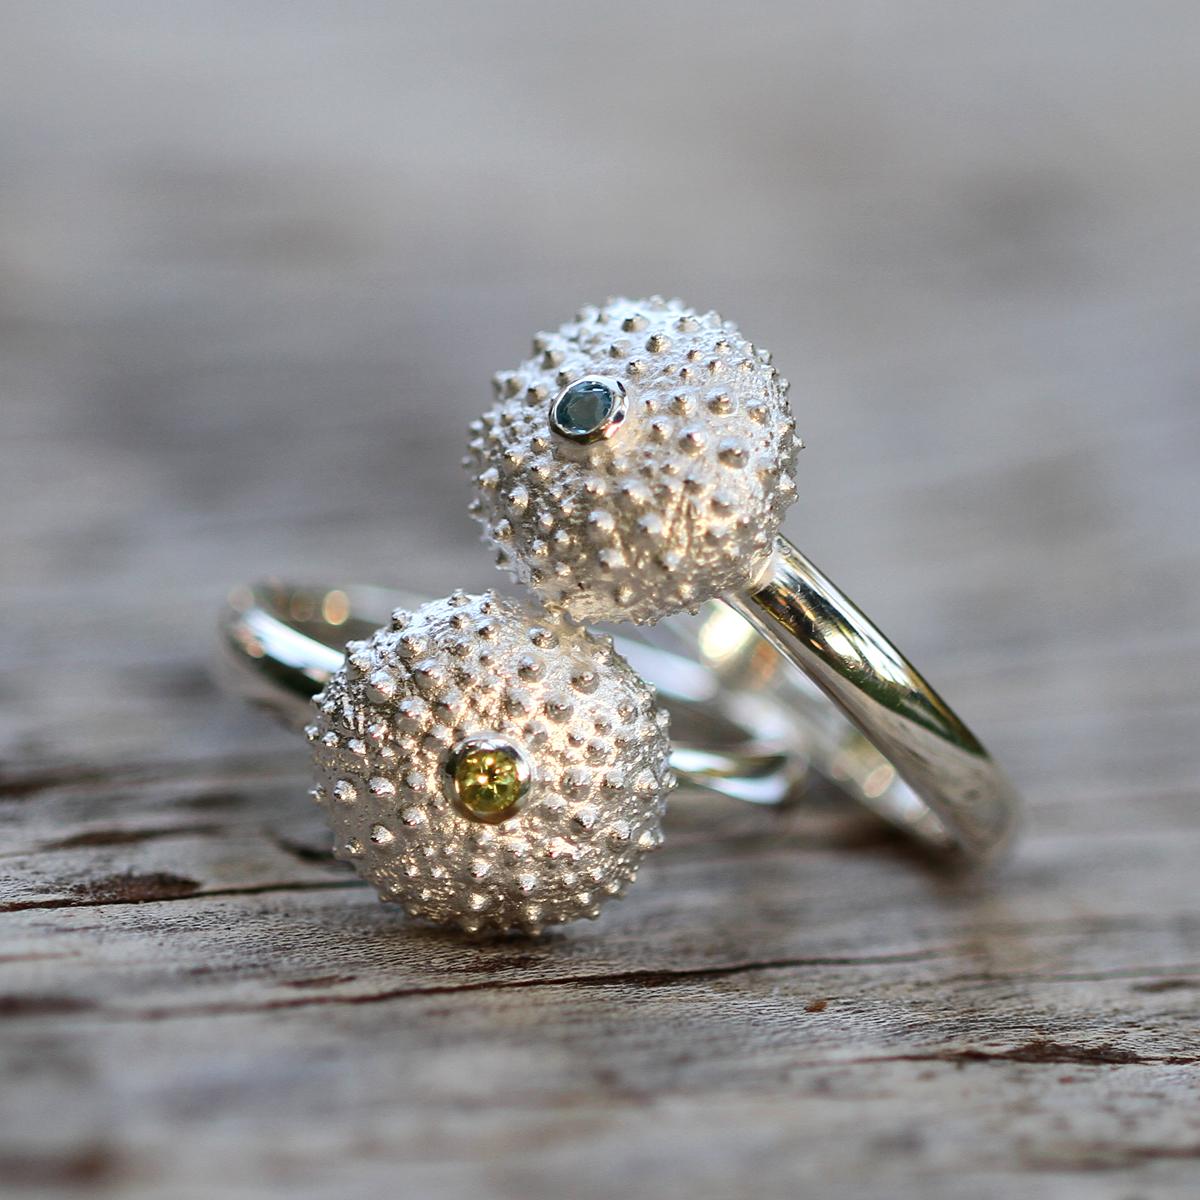 Sea urchin minis